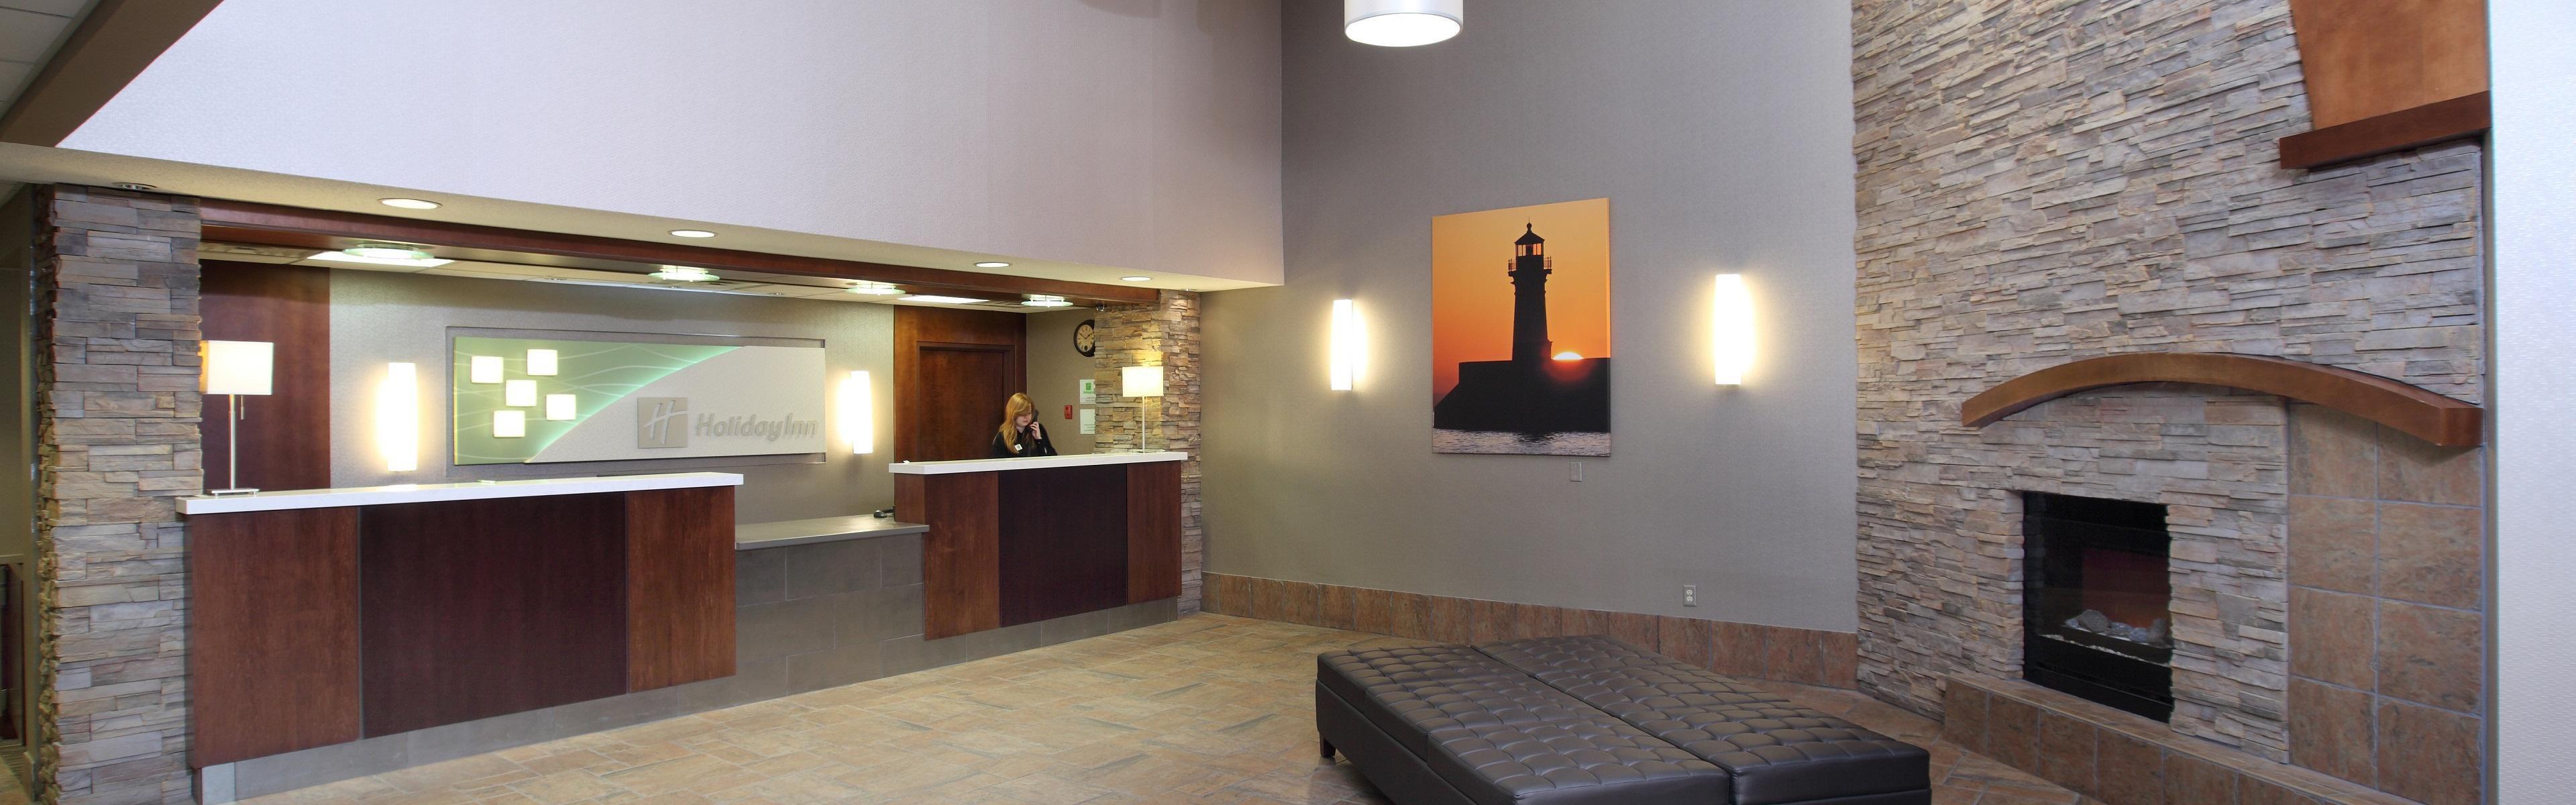 Entrance; Hotel Lobby ...